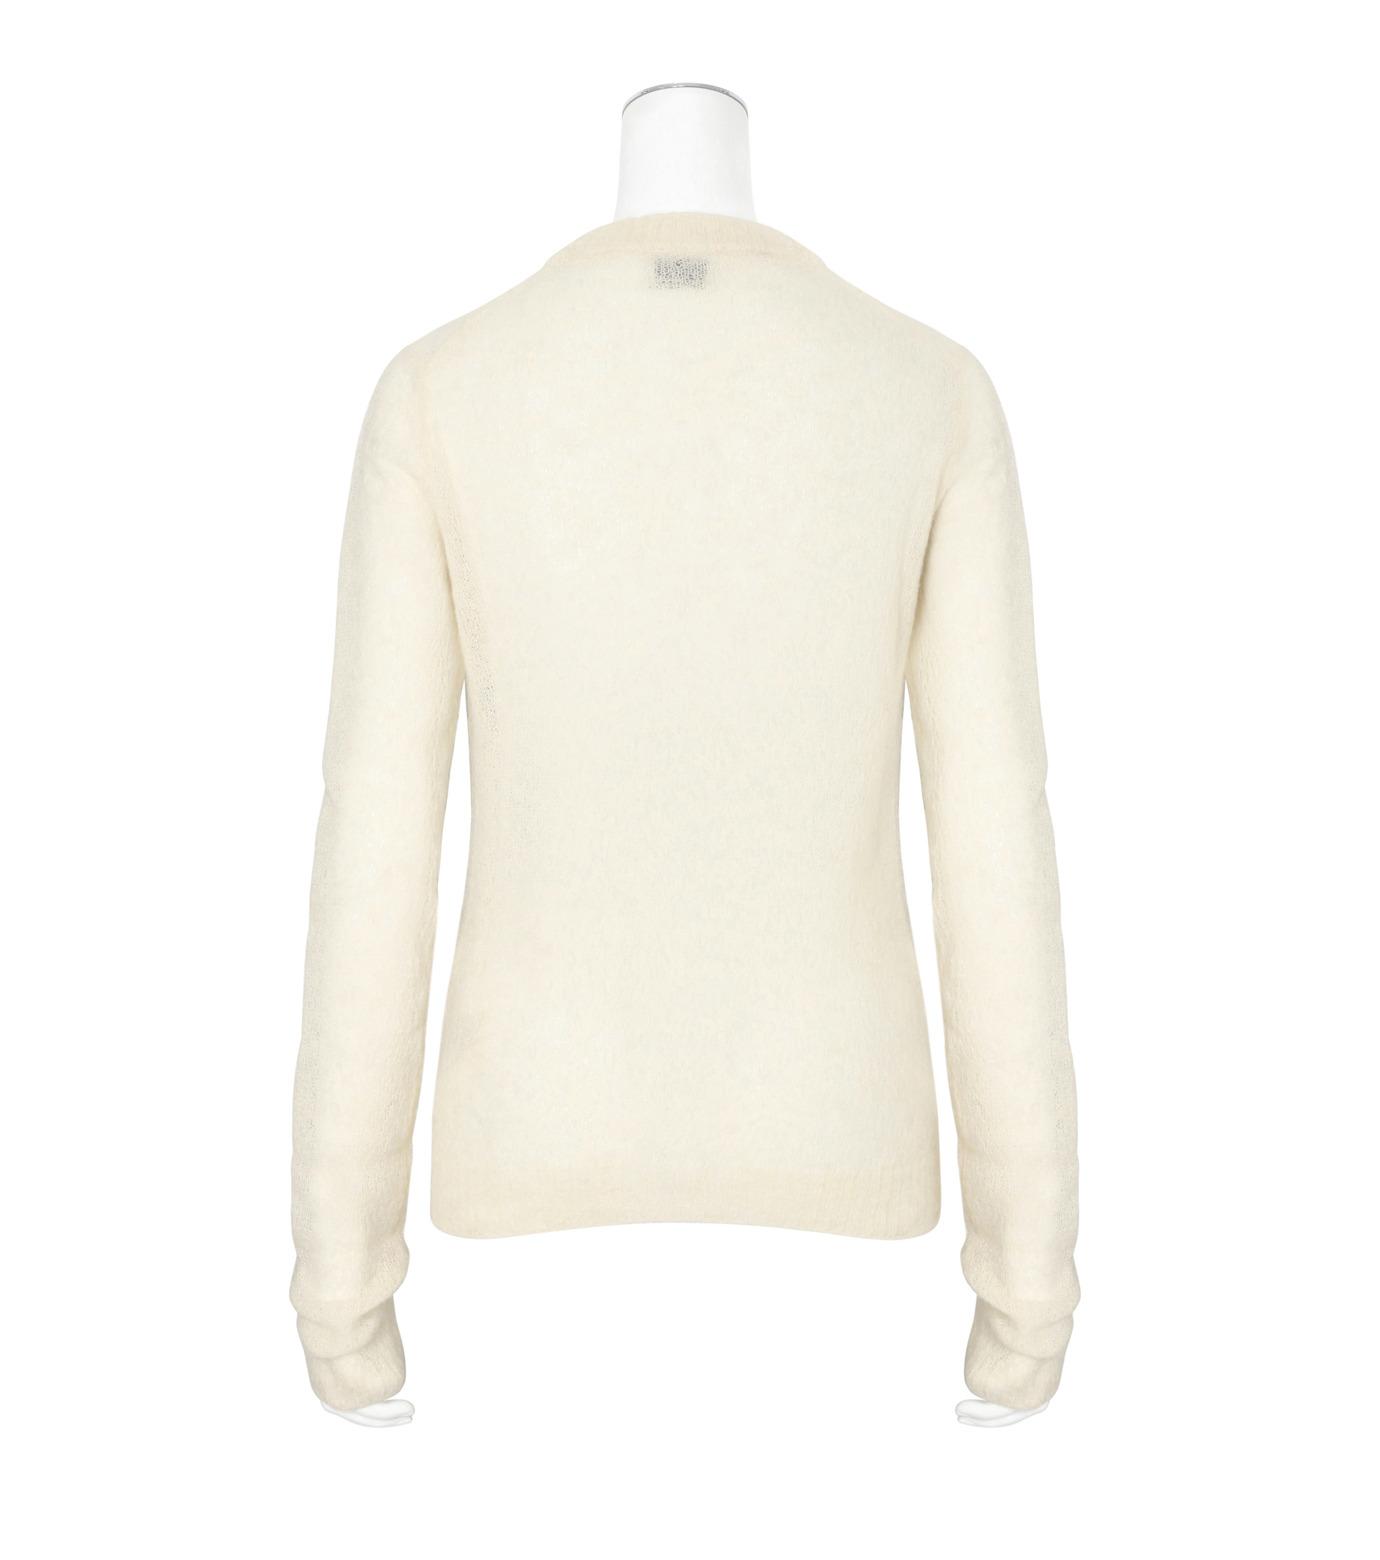 ACNE STUDIOS(アクネ ストゥディオズ)のAlpaca Extra LS Pullover-WHITE(ニット/knit)-19F166-5 拡大詳細画像2